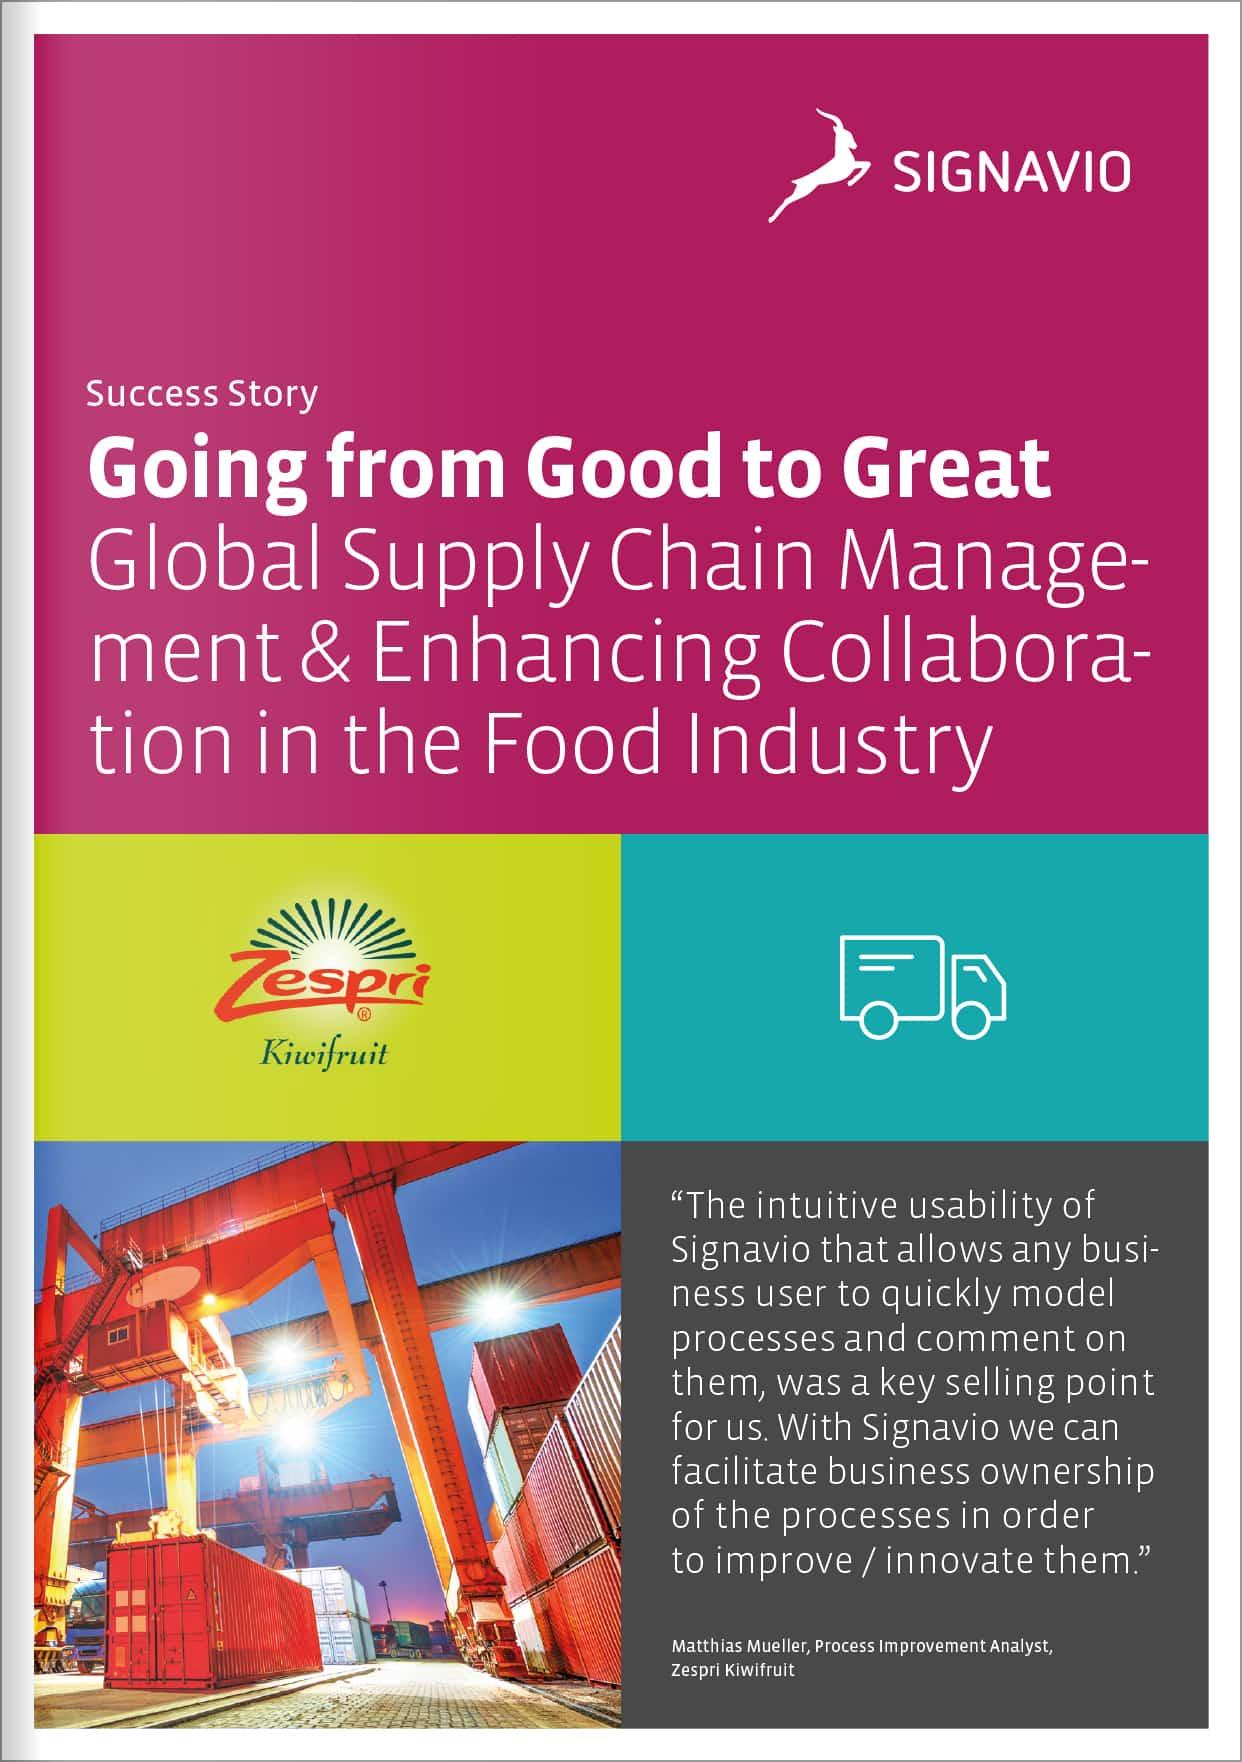 Zespri - APAC Customer Success